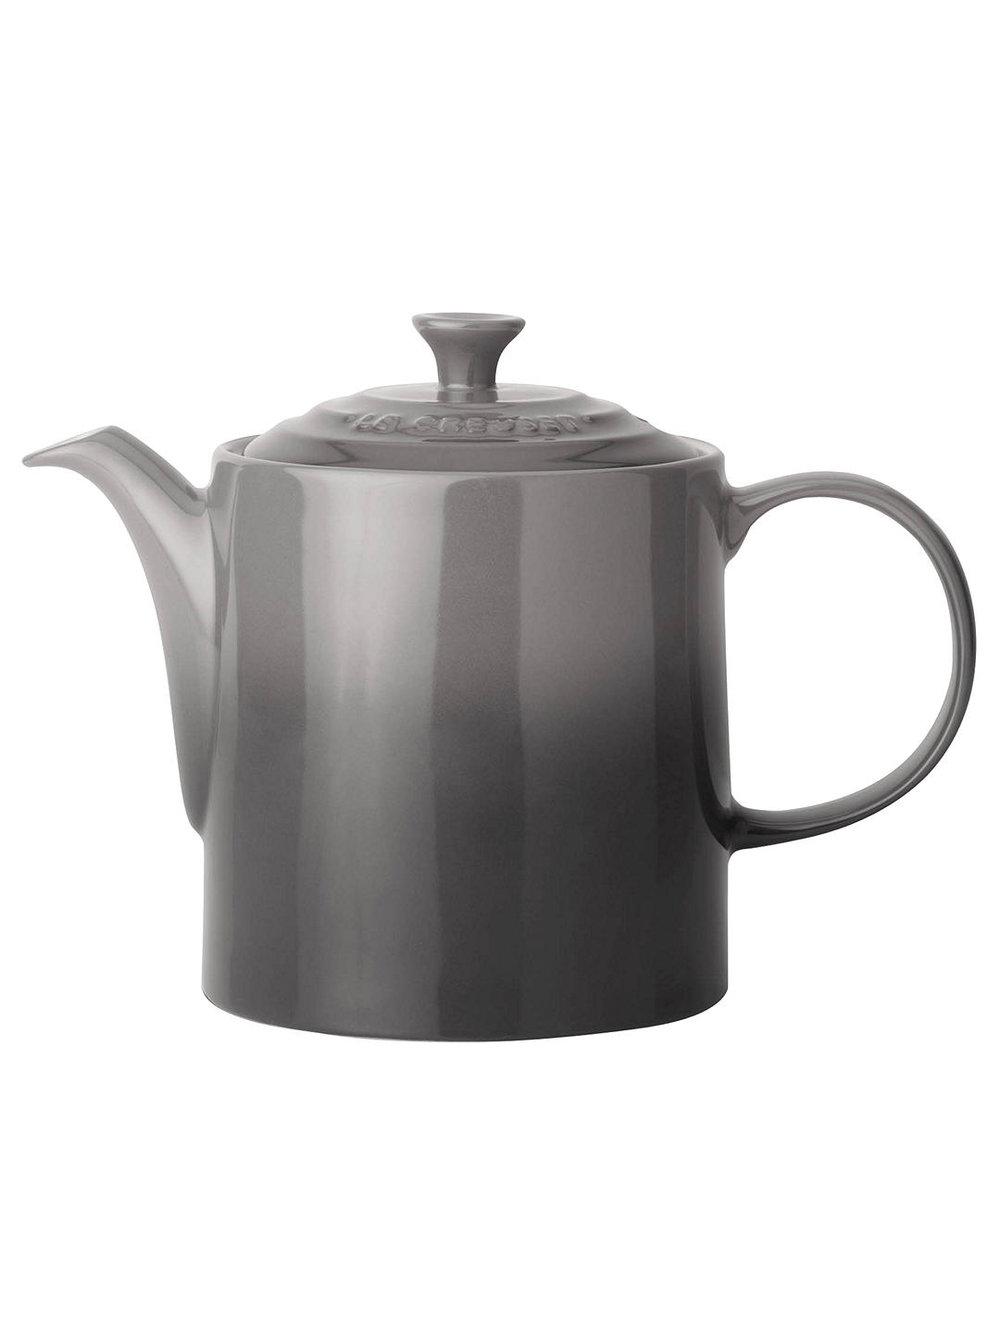 Le Creuset Teapot, John Lewis, £29.40